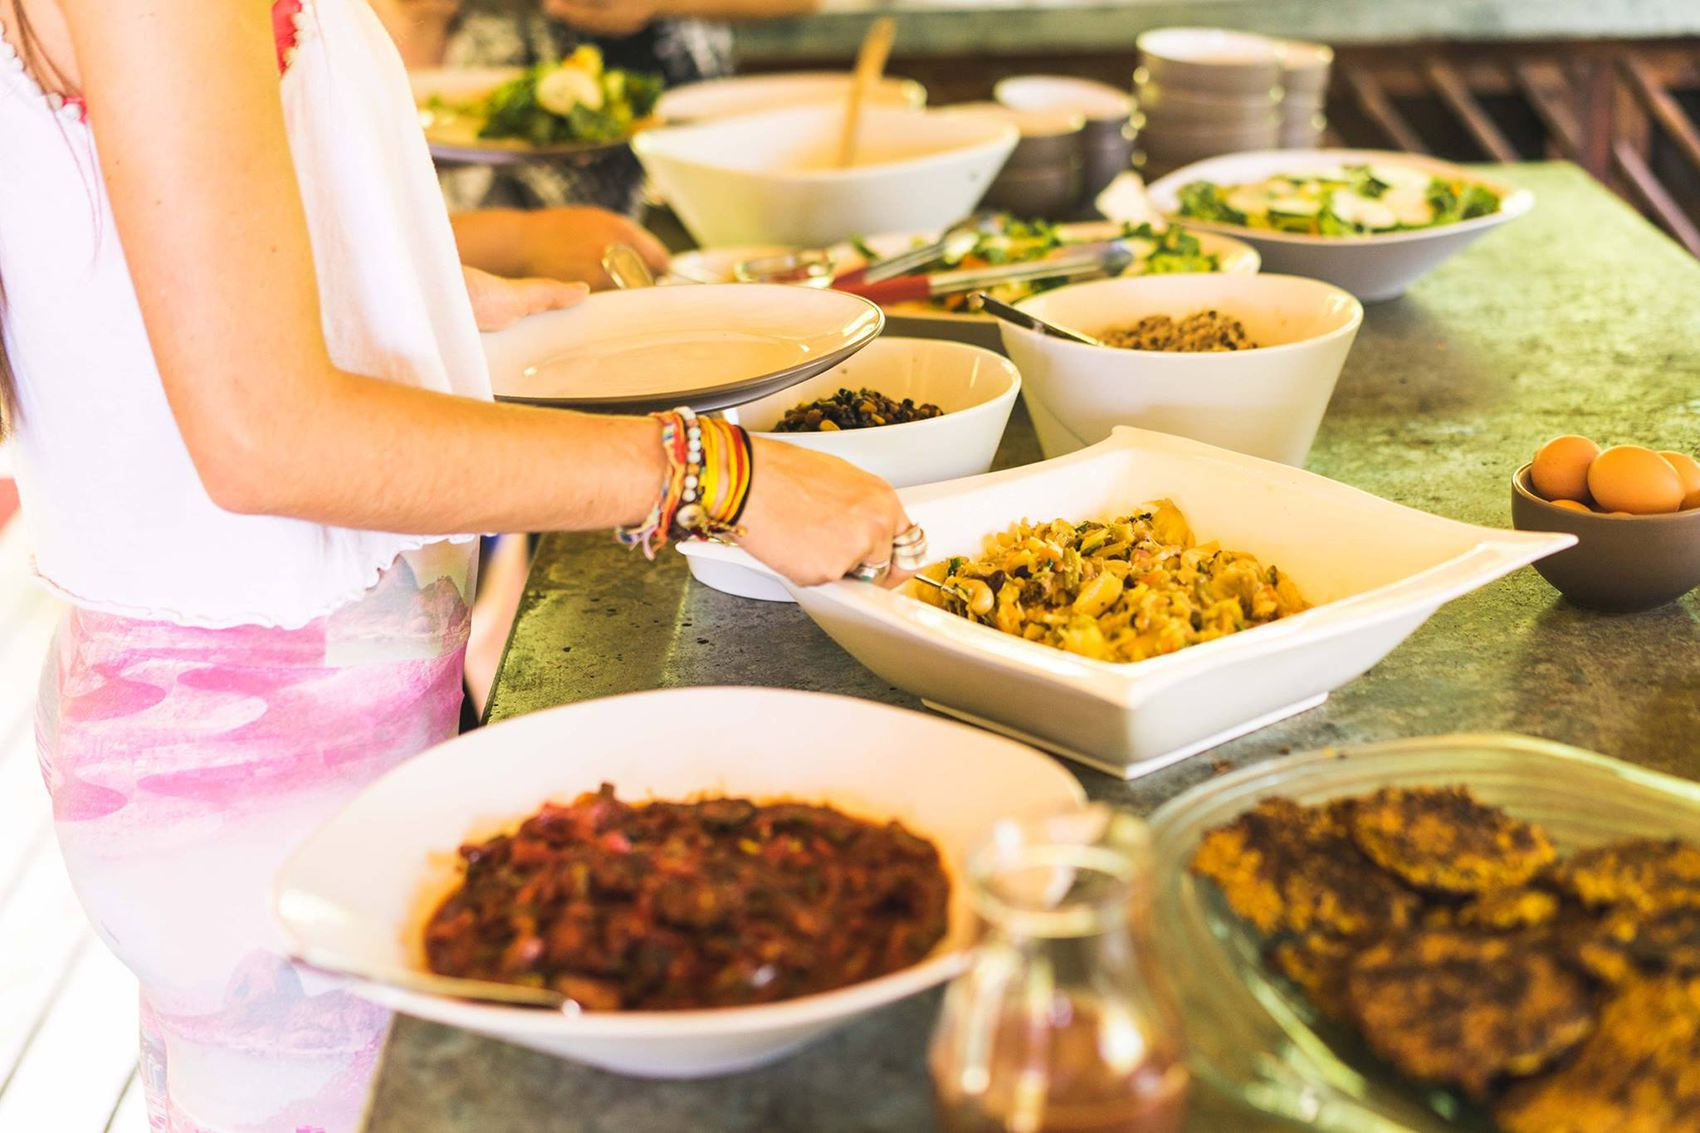 retreat_selva-armonia_vegan-january_2016-gourmet_vegan_meal.jpg